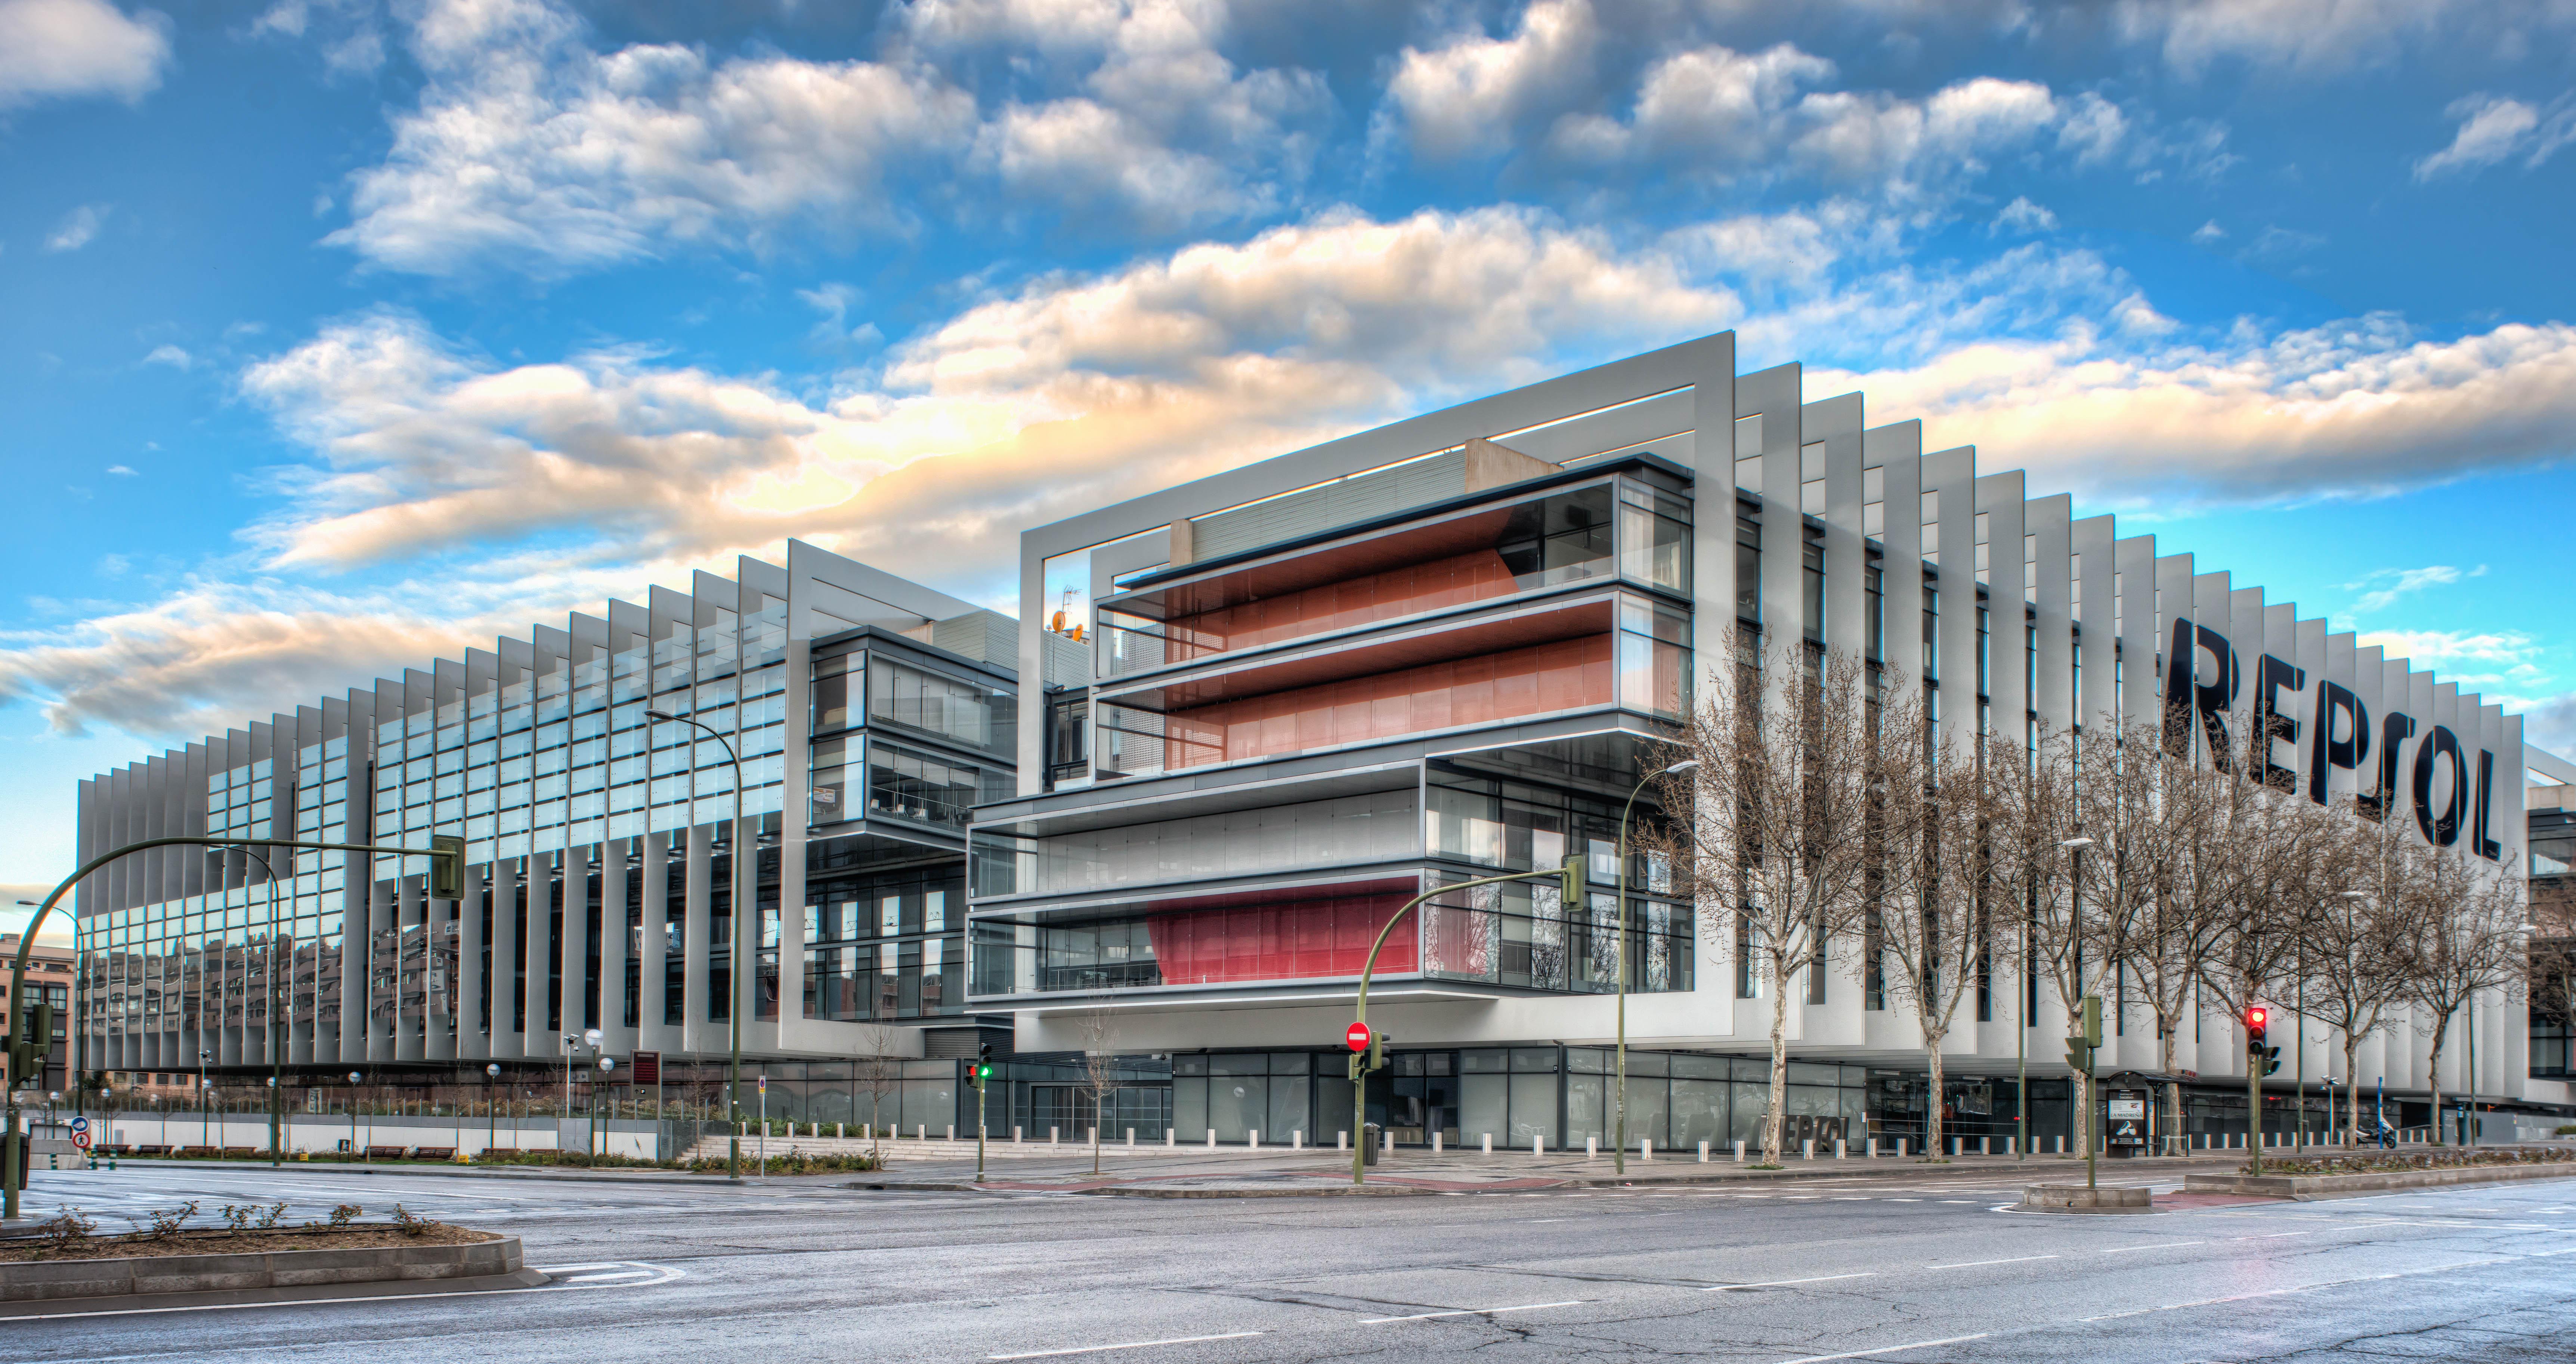 Open house 2016 la arquitectura de madrid se abre a los for Repsol oficinas